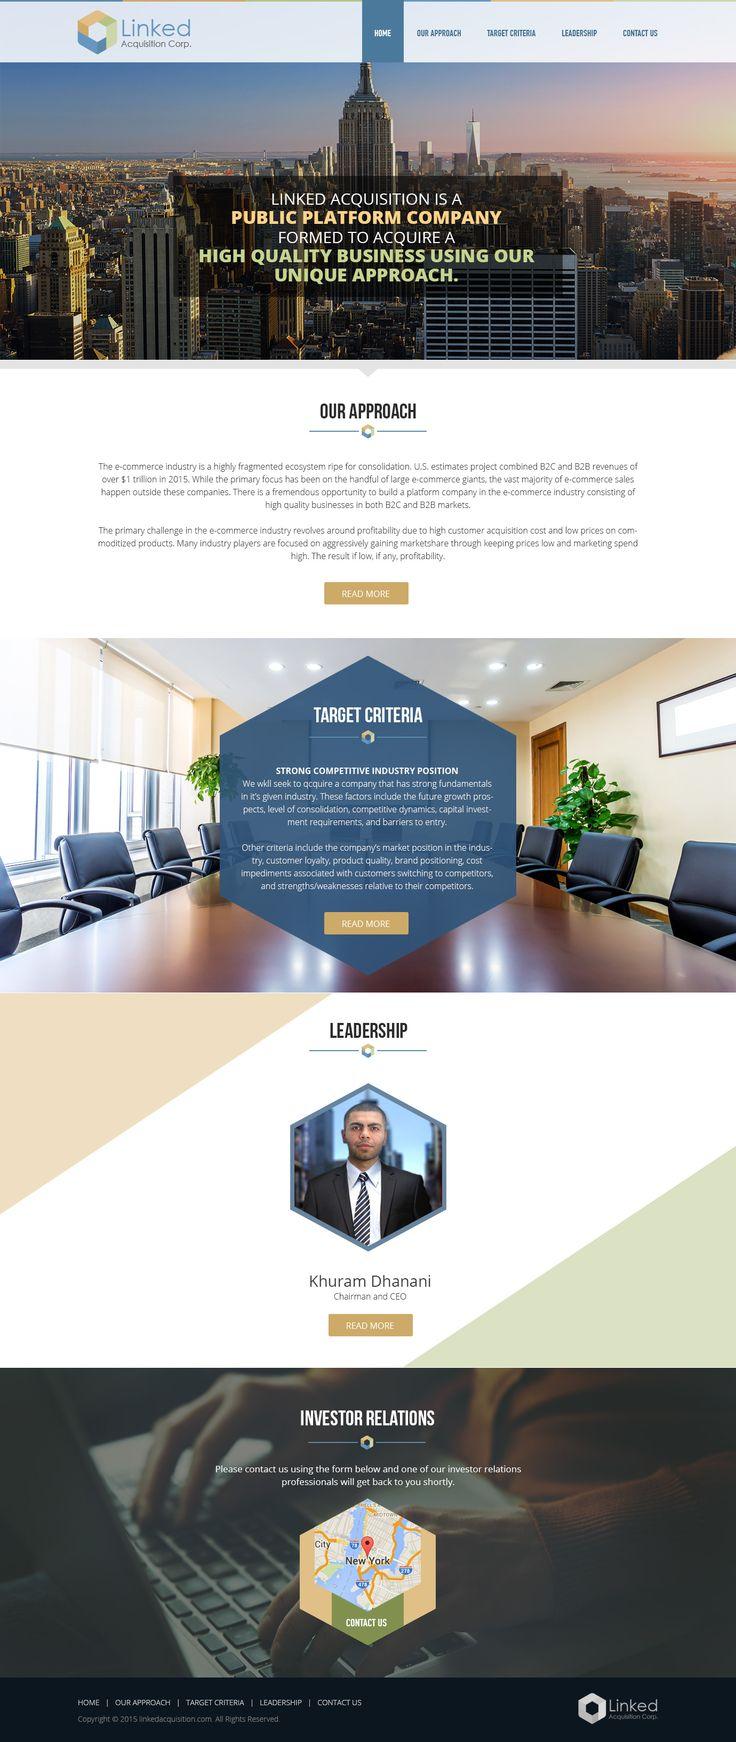 Wordpress-DESIGNER---Must-have-DESIGN-Skills